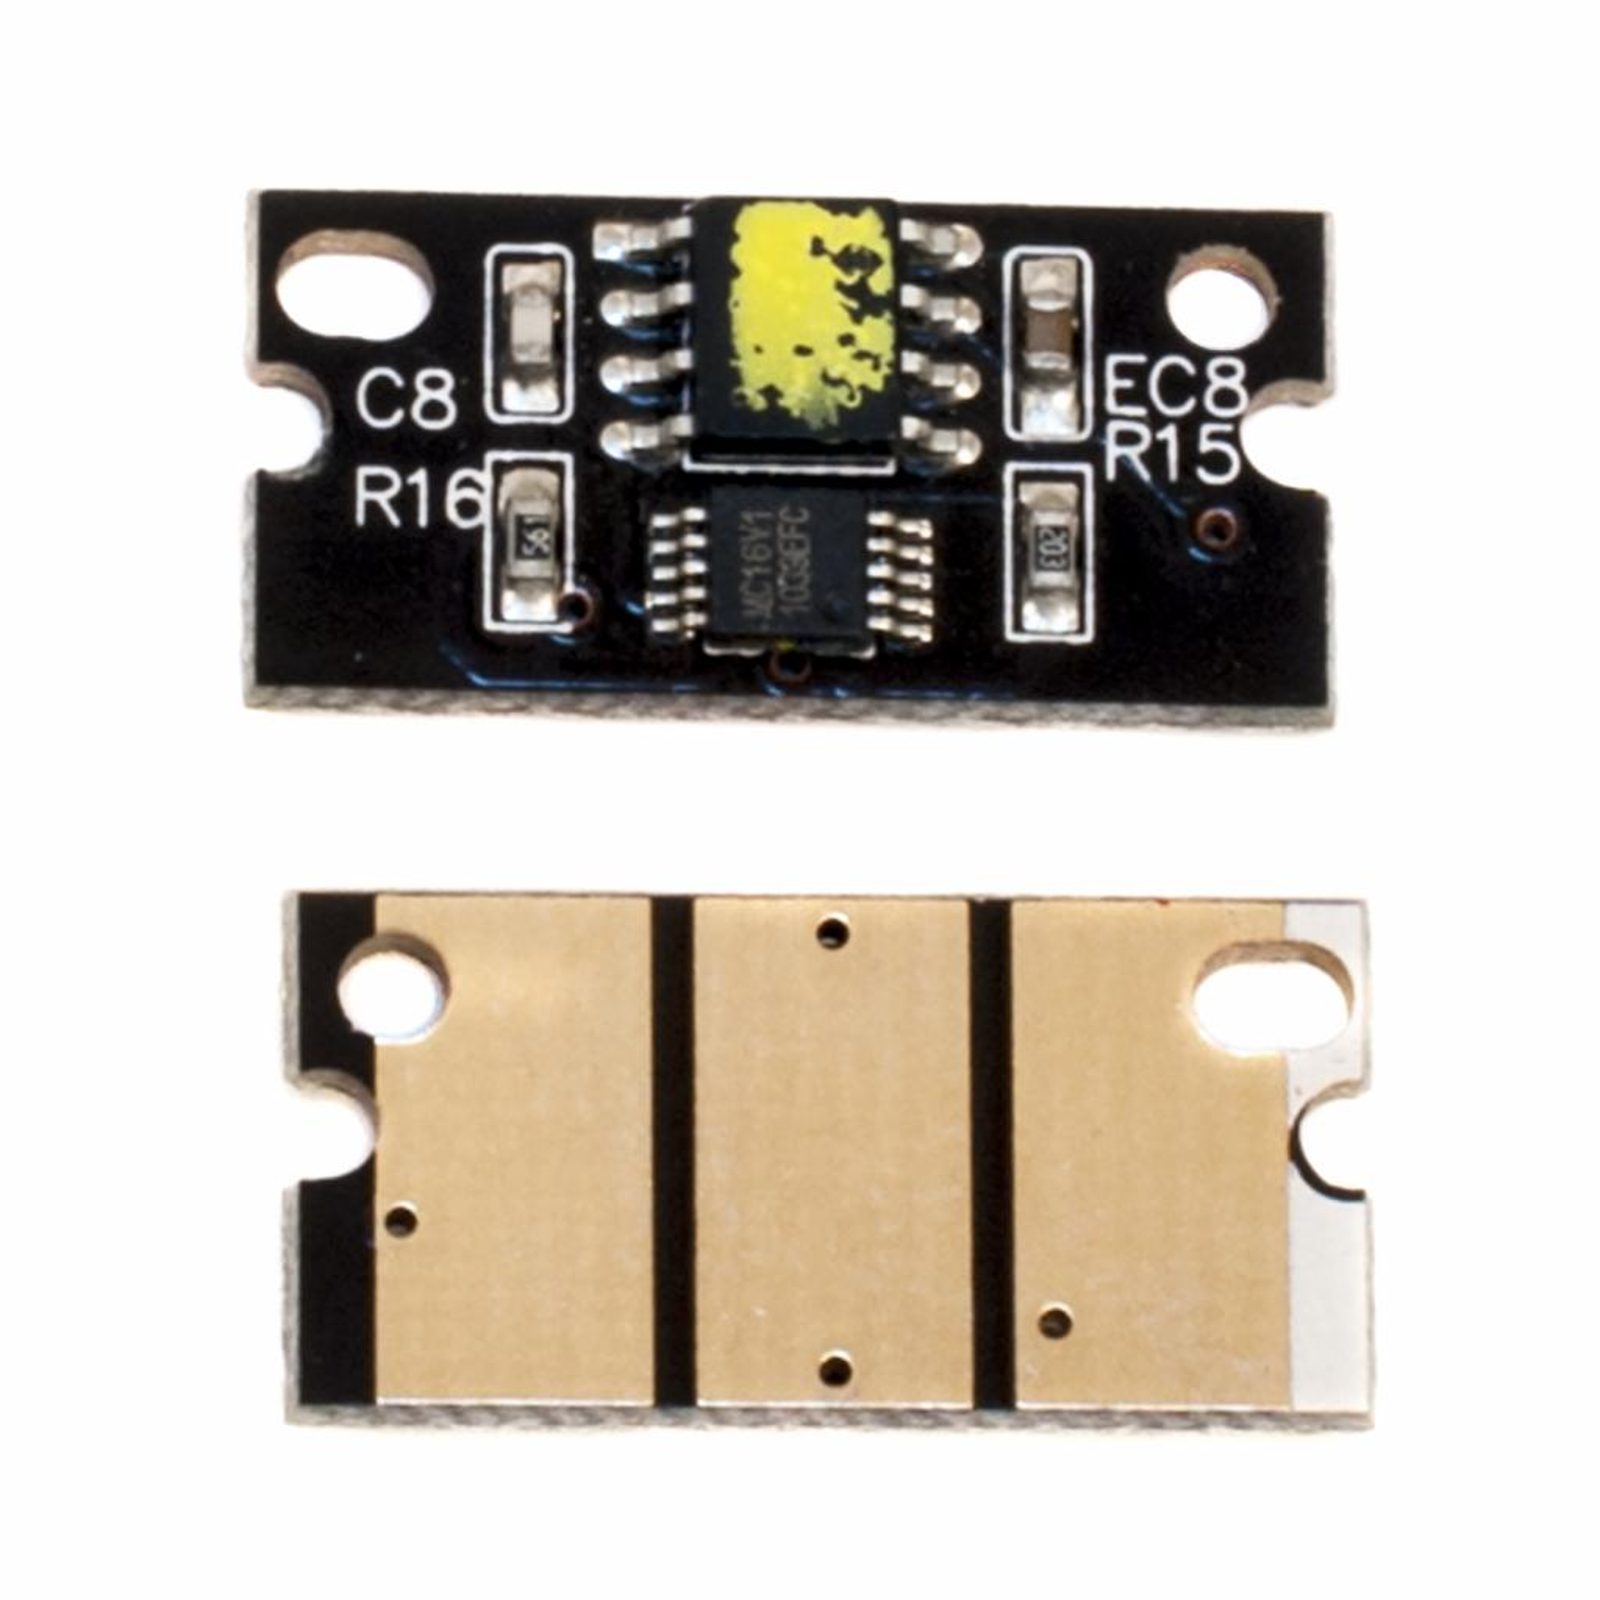 Чип для картриджа EPSON ACULASER C1600/СХ16 YELLOW Apex (ALE-1600-Y-2,5K)